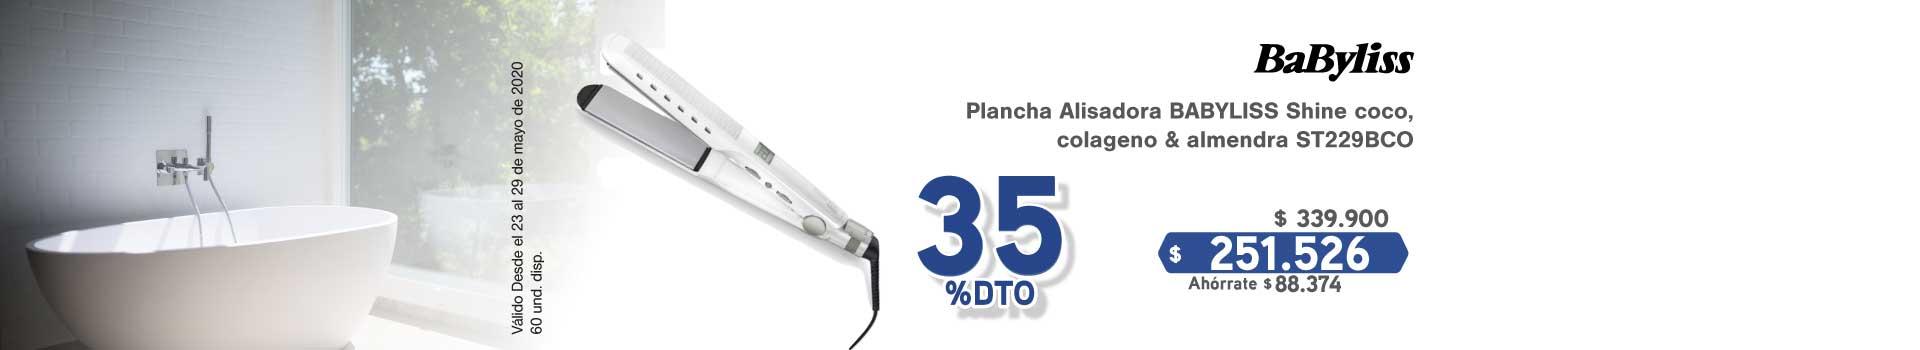 AK-KT-BIGTOP4 PLANCHA BABYLISS PLUS 23 MAYO